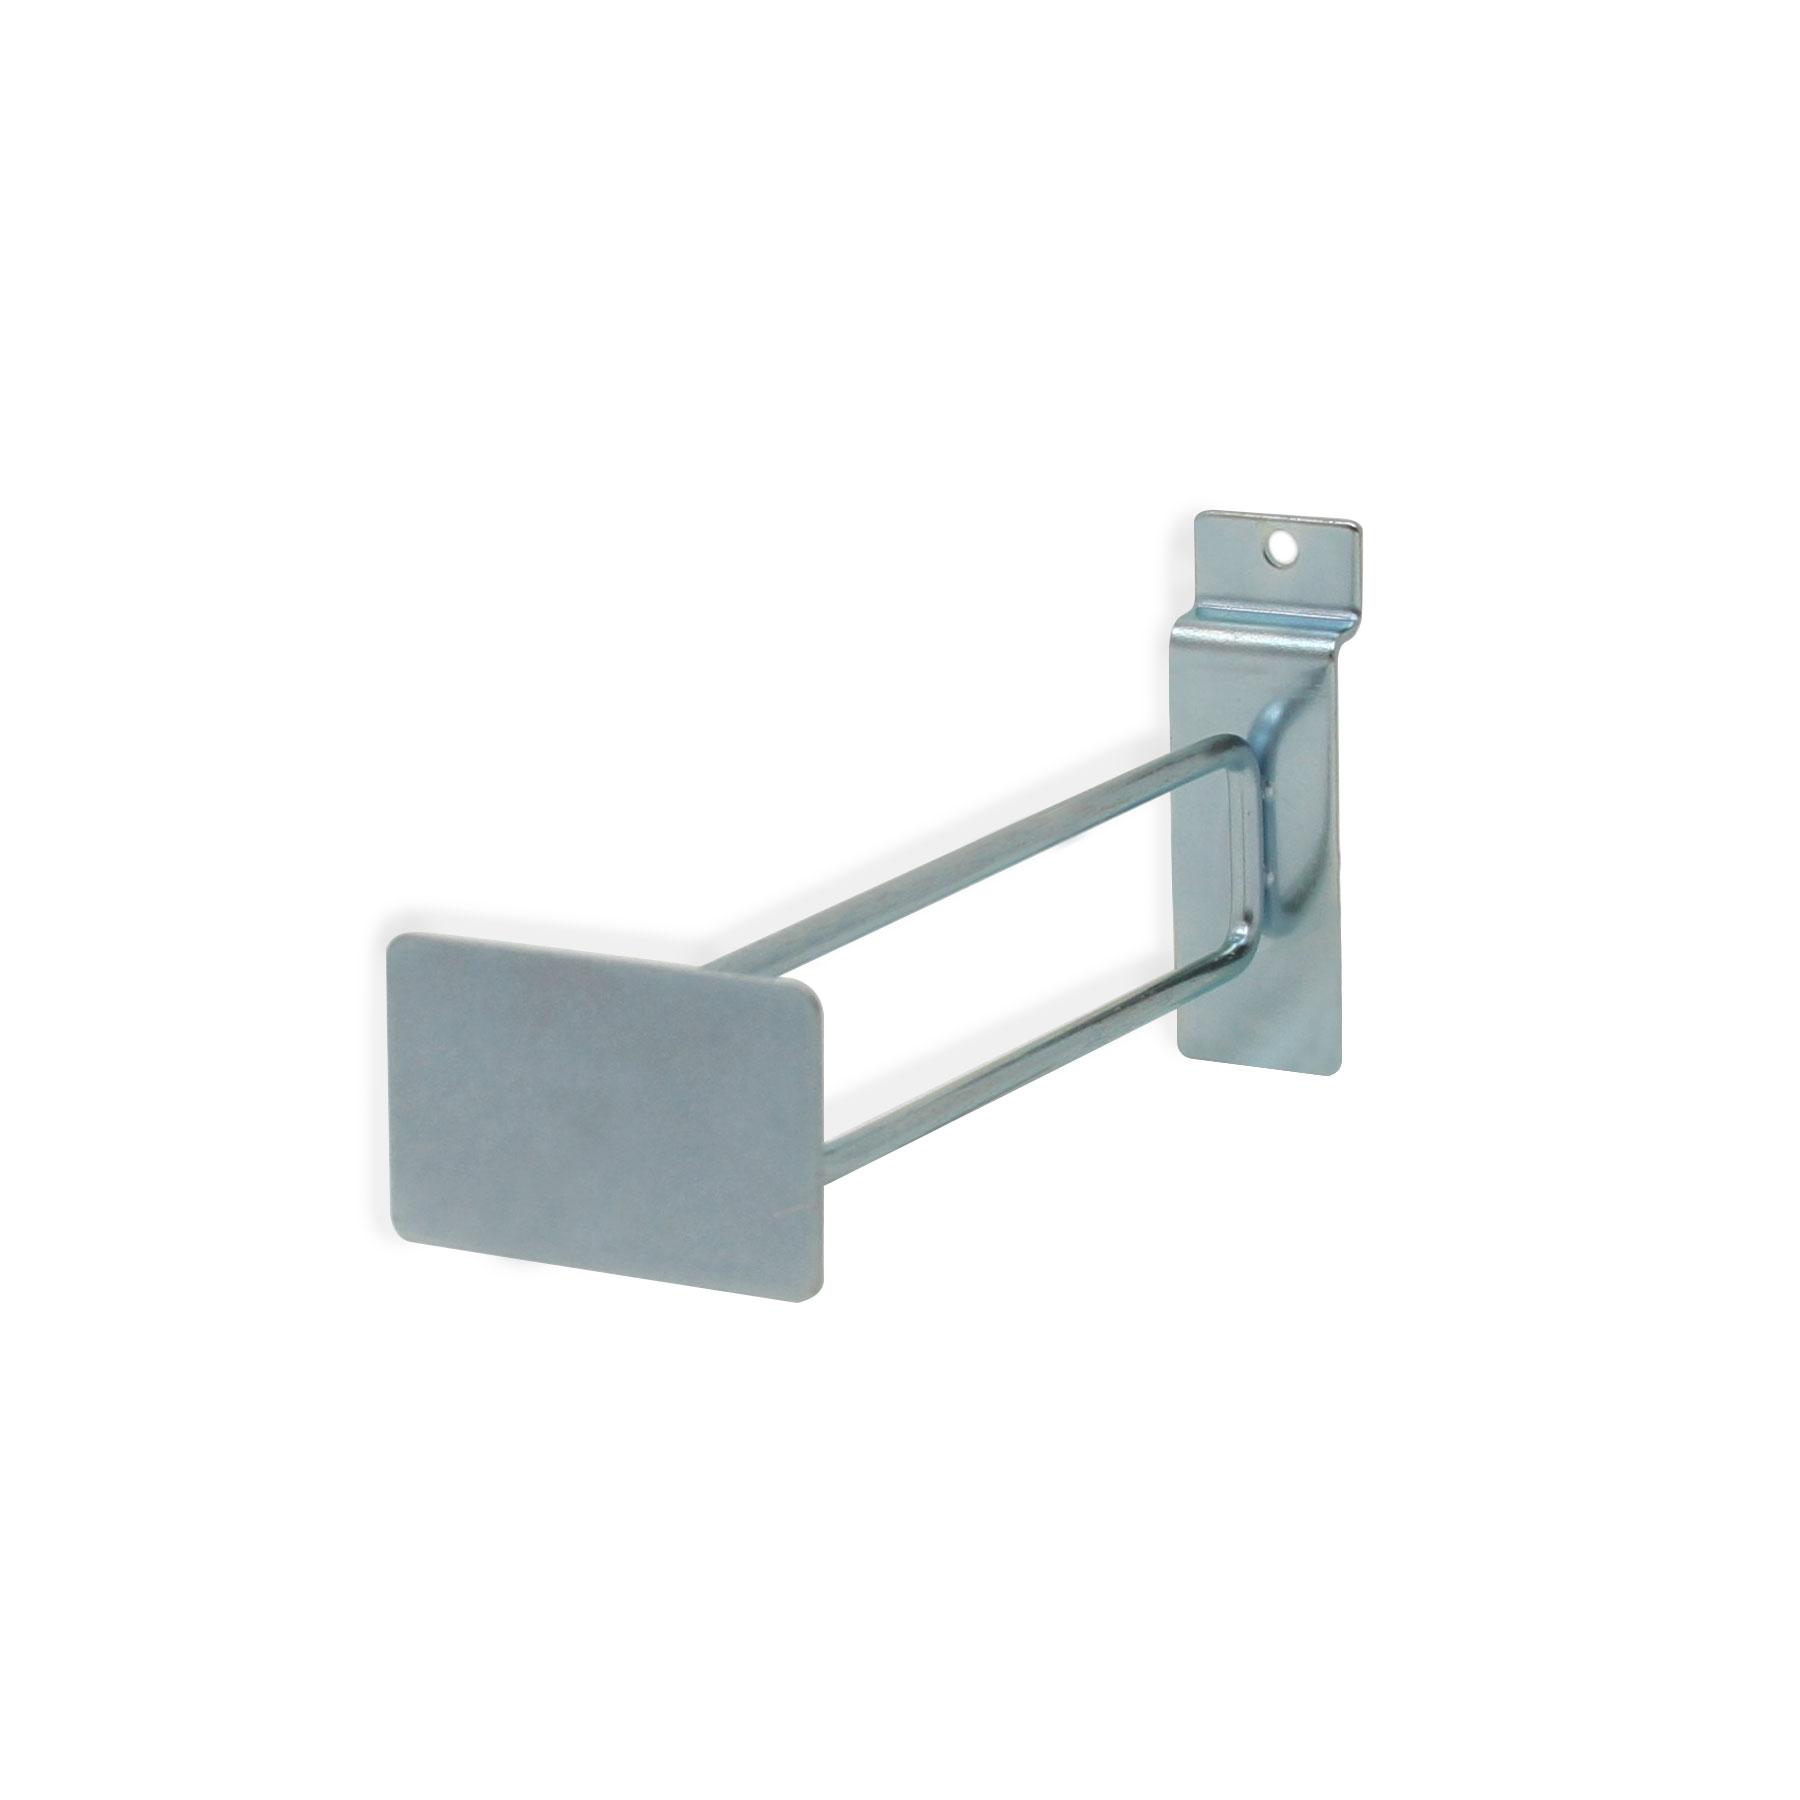 Slatwall Metal Plate Scanner Hook